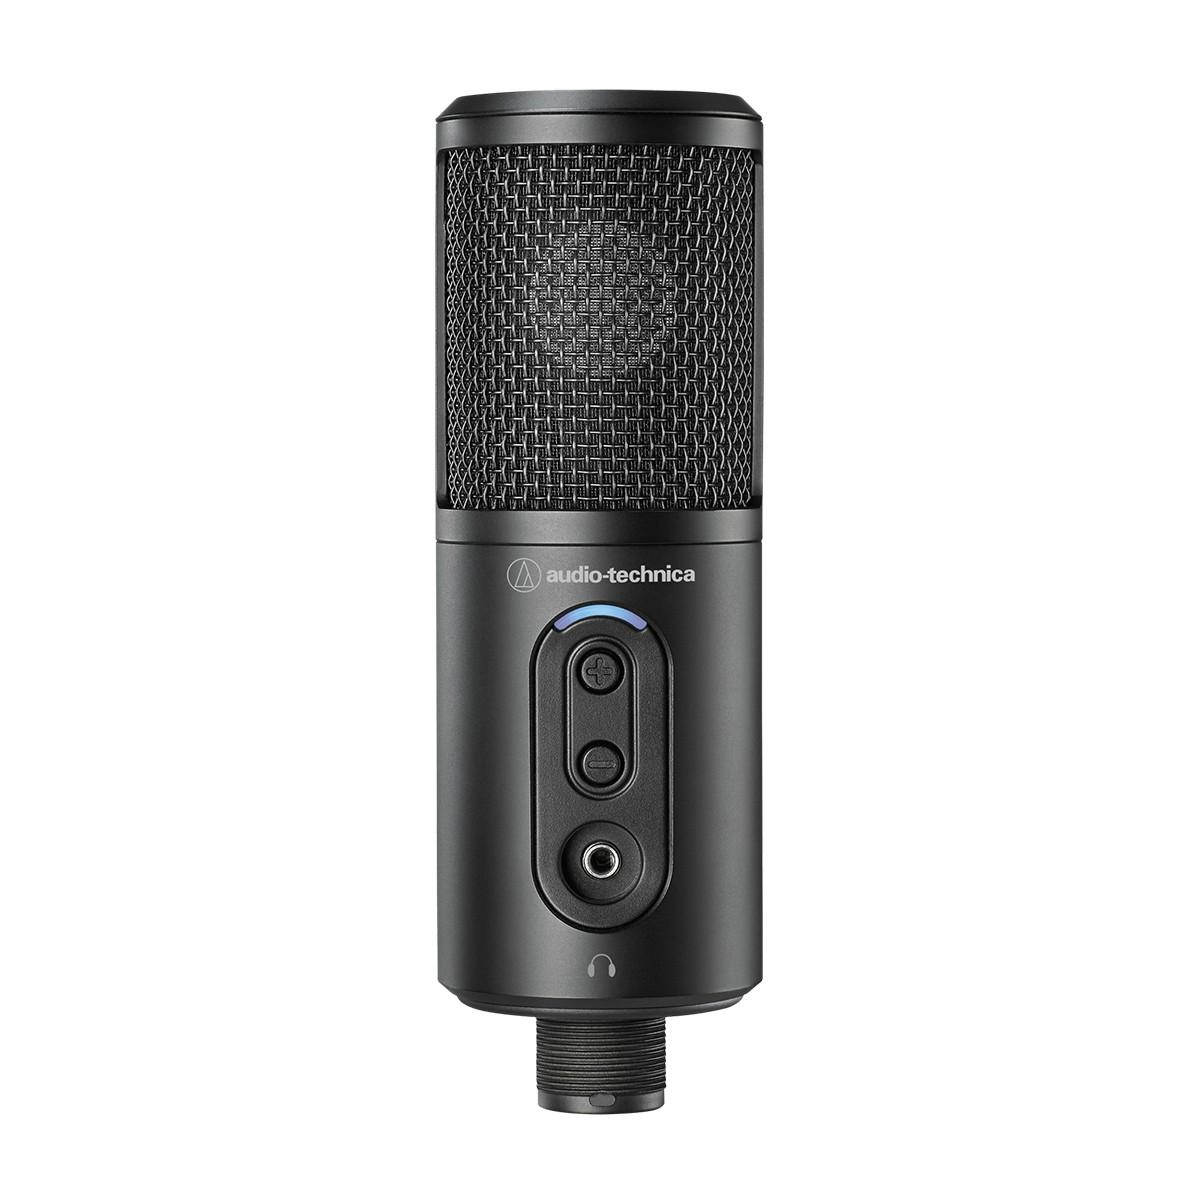 Microfone Condensador USB Audio-Technica ATR2500X-USB